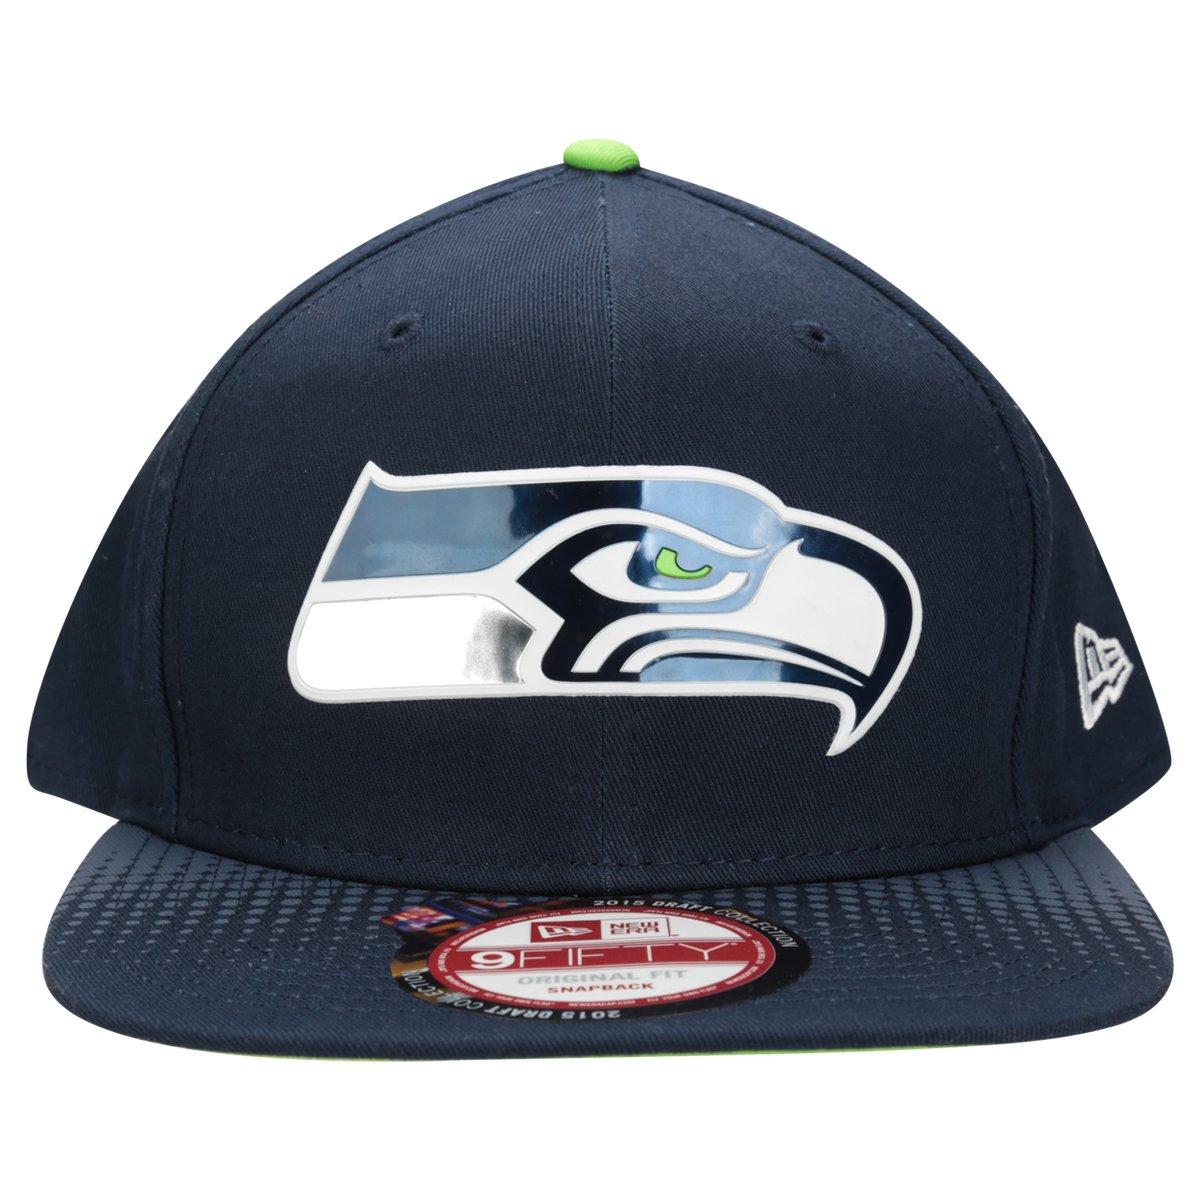 bb1142d4c Boné New Era NFL 950 Official Draft Seattle Seahawks - Compre Agora ...